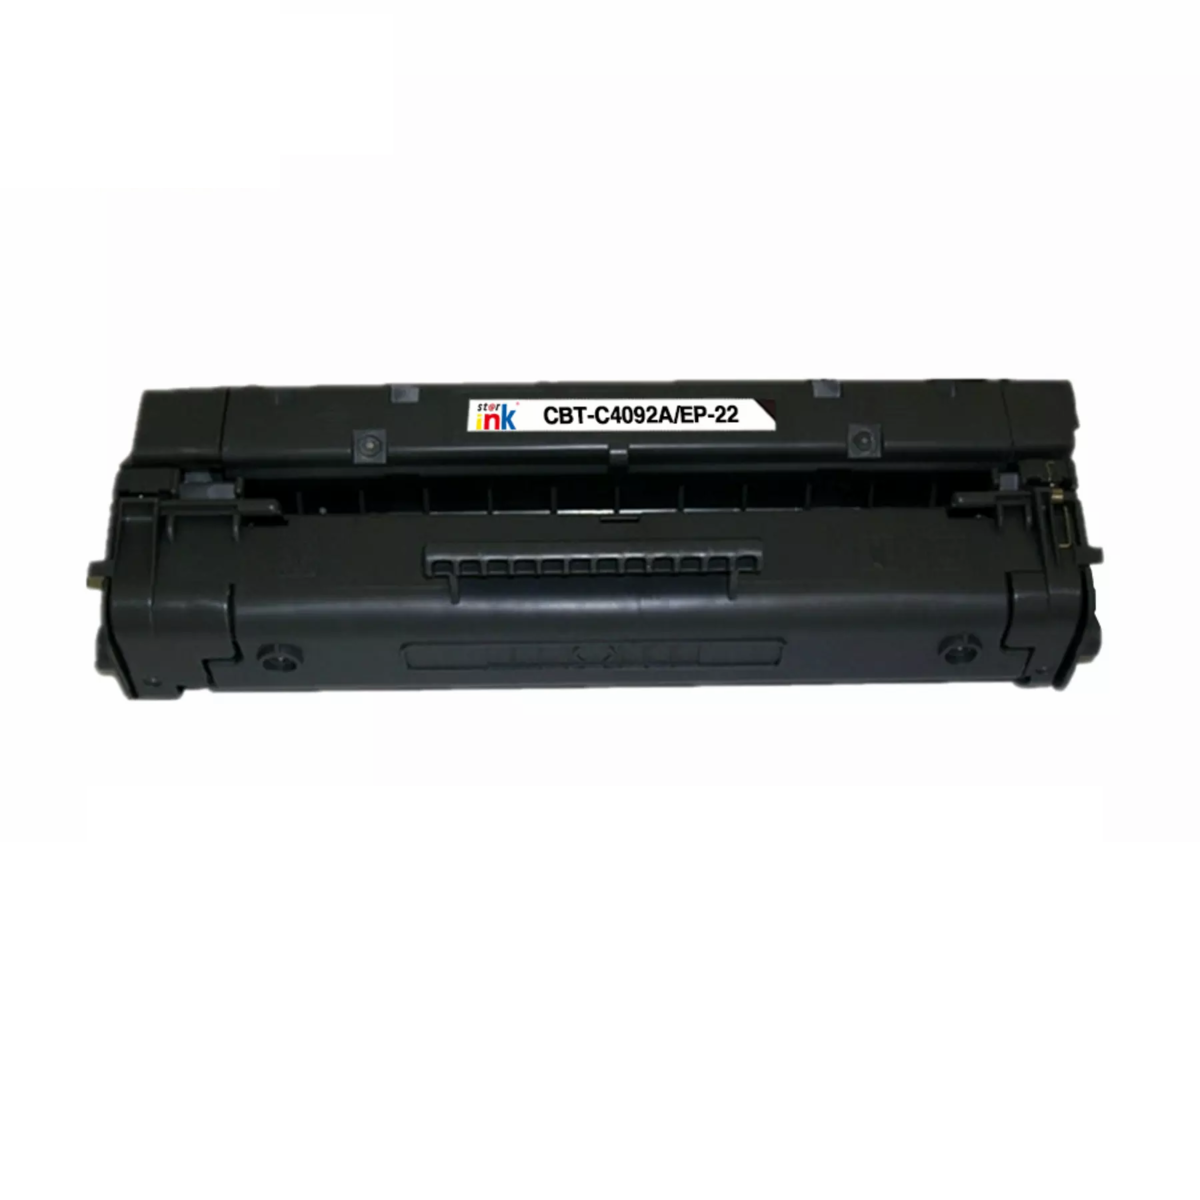 Starink kompatibilný s čipom toner HP C4092A (Čierny)